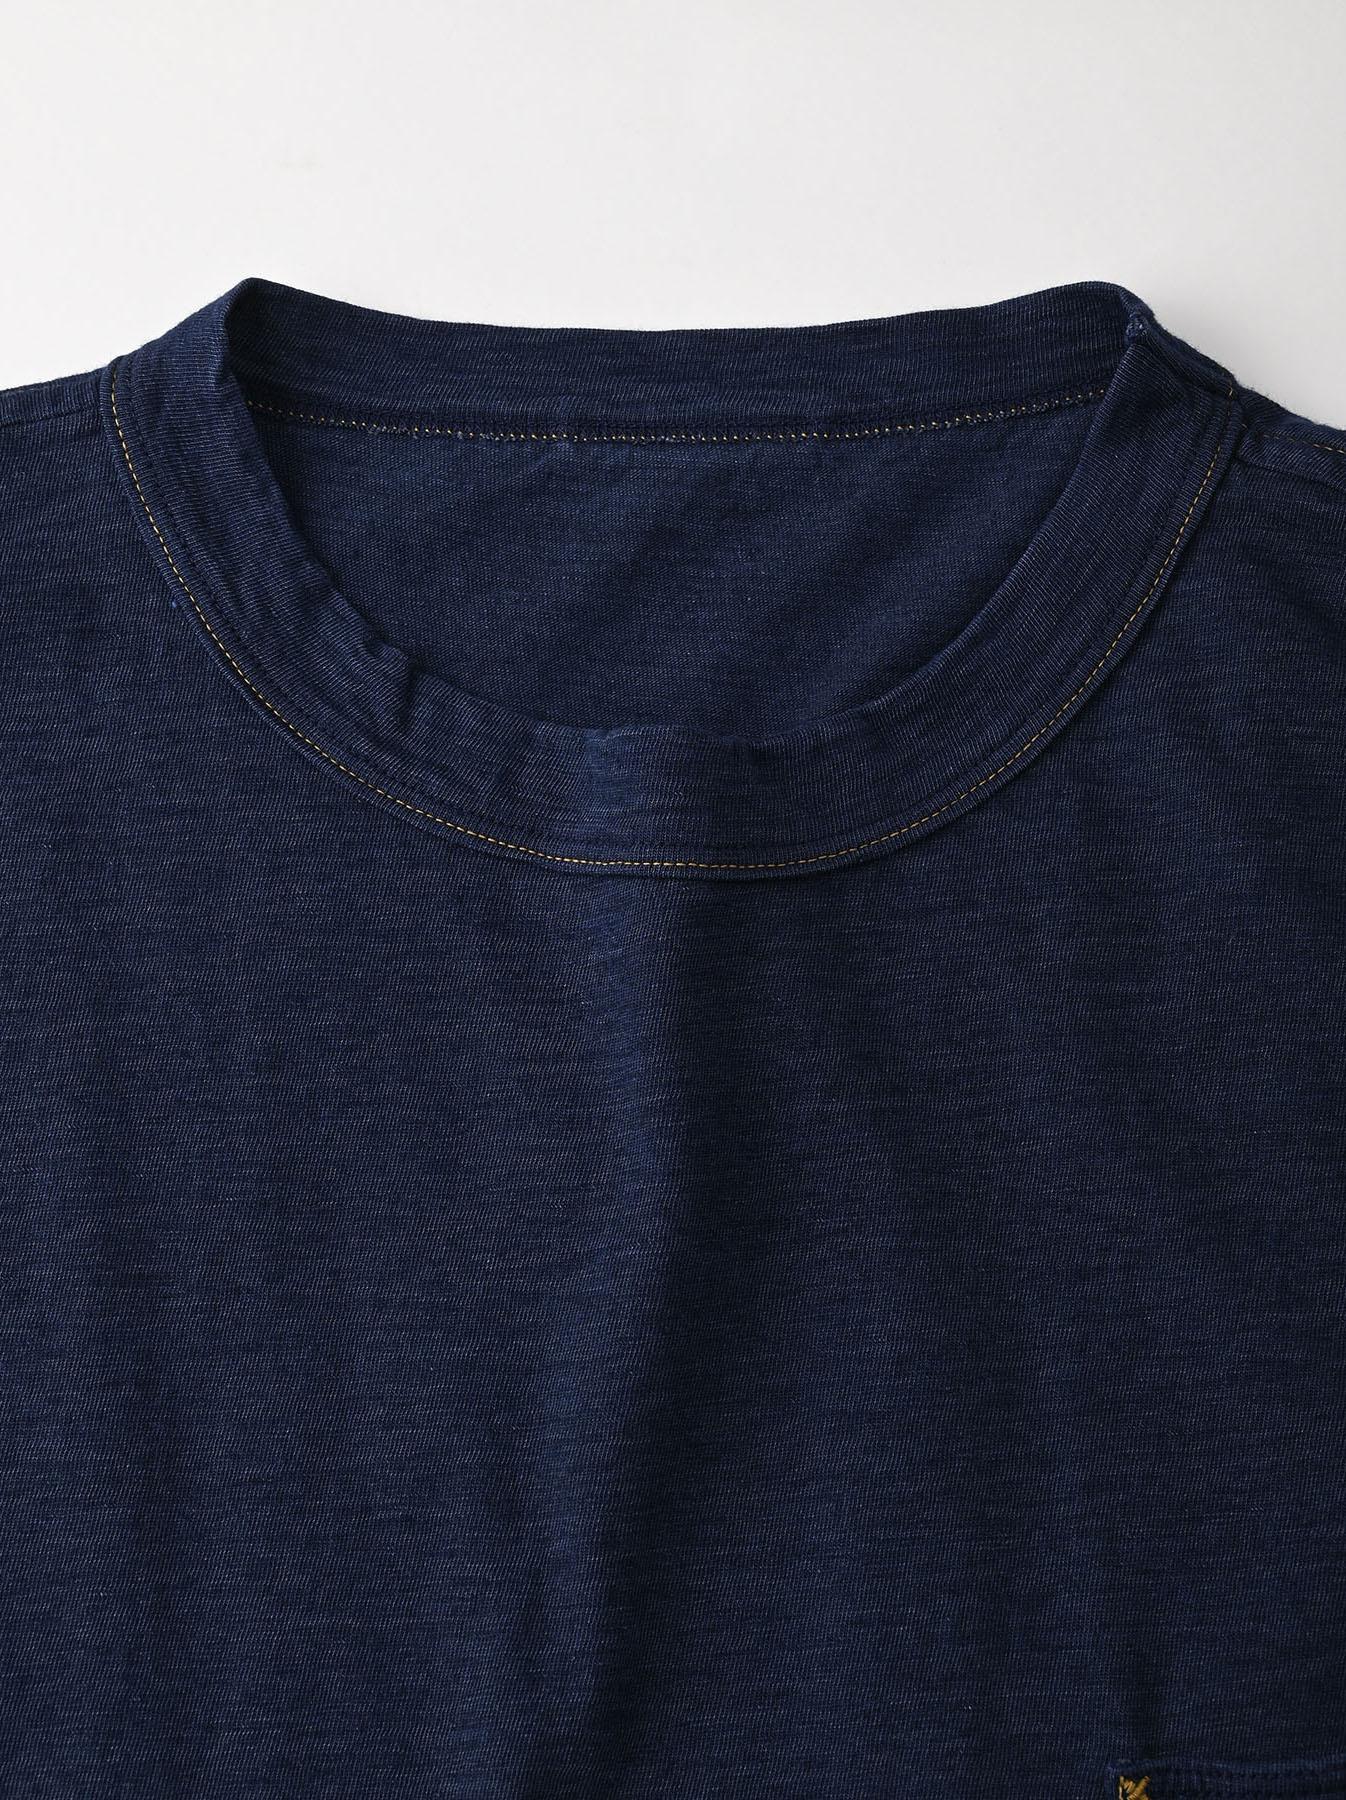 Indigo Hayama-kun Embroidered 908 Ocean T-shirt (0621)-7